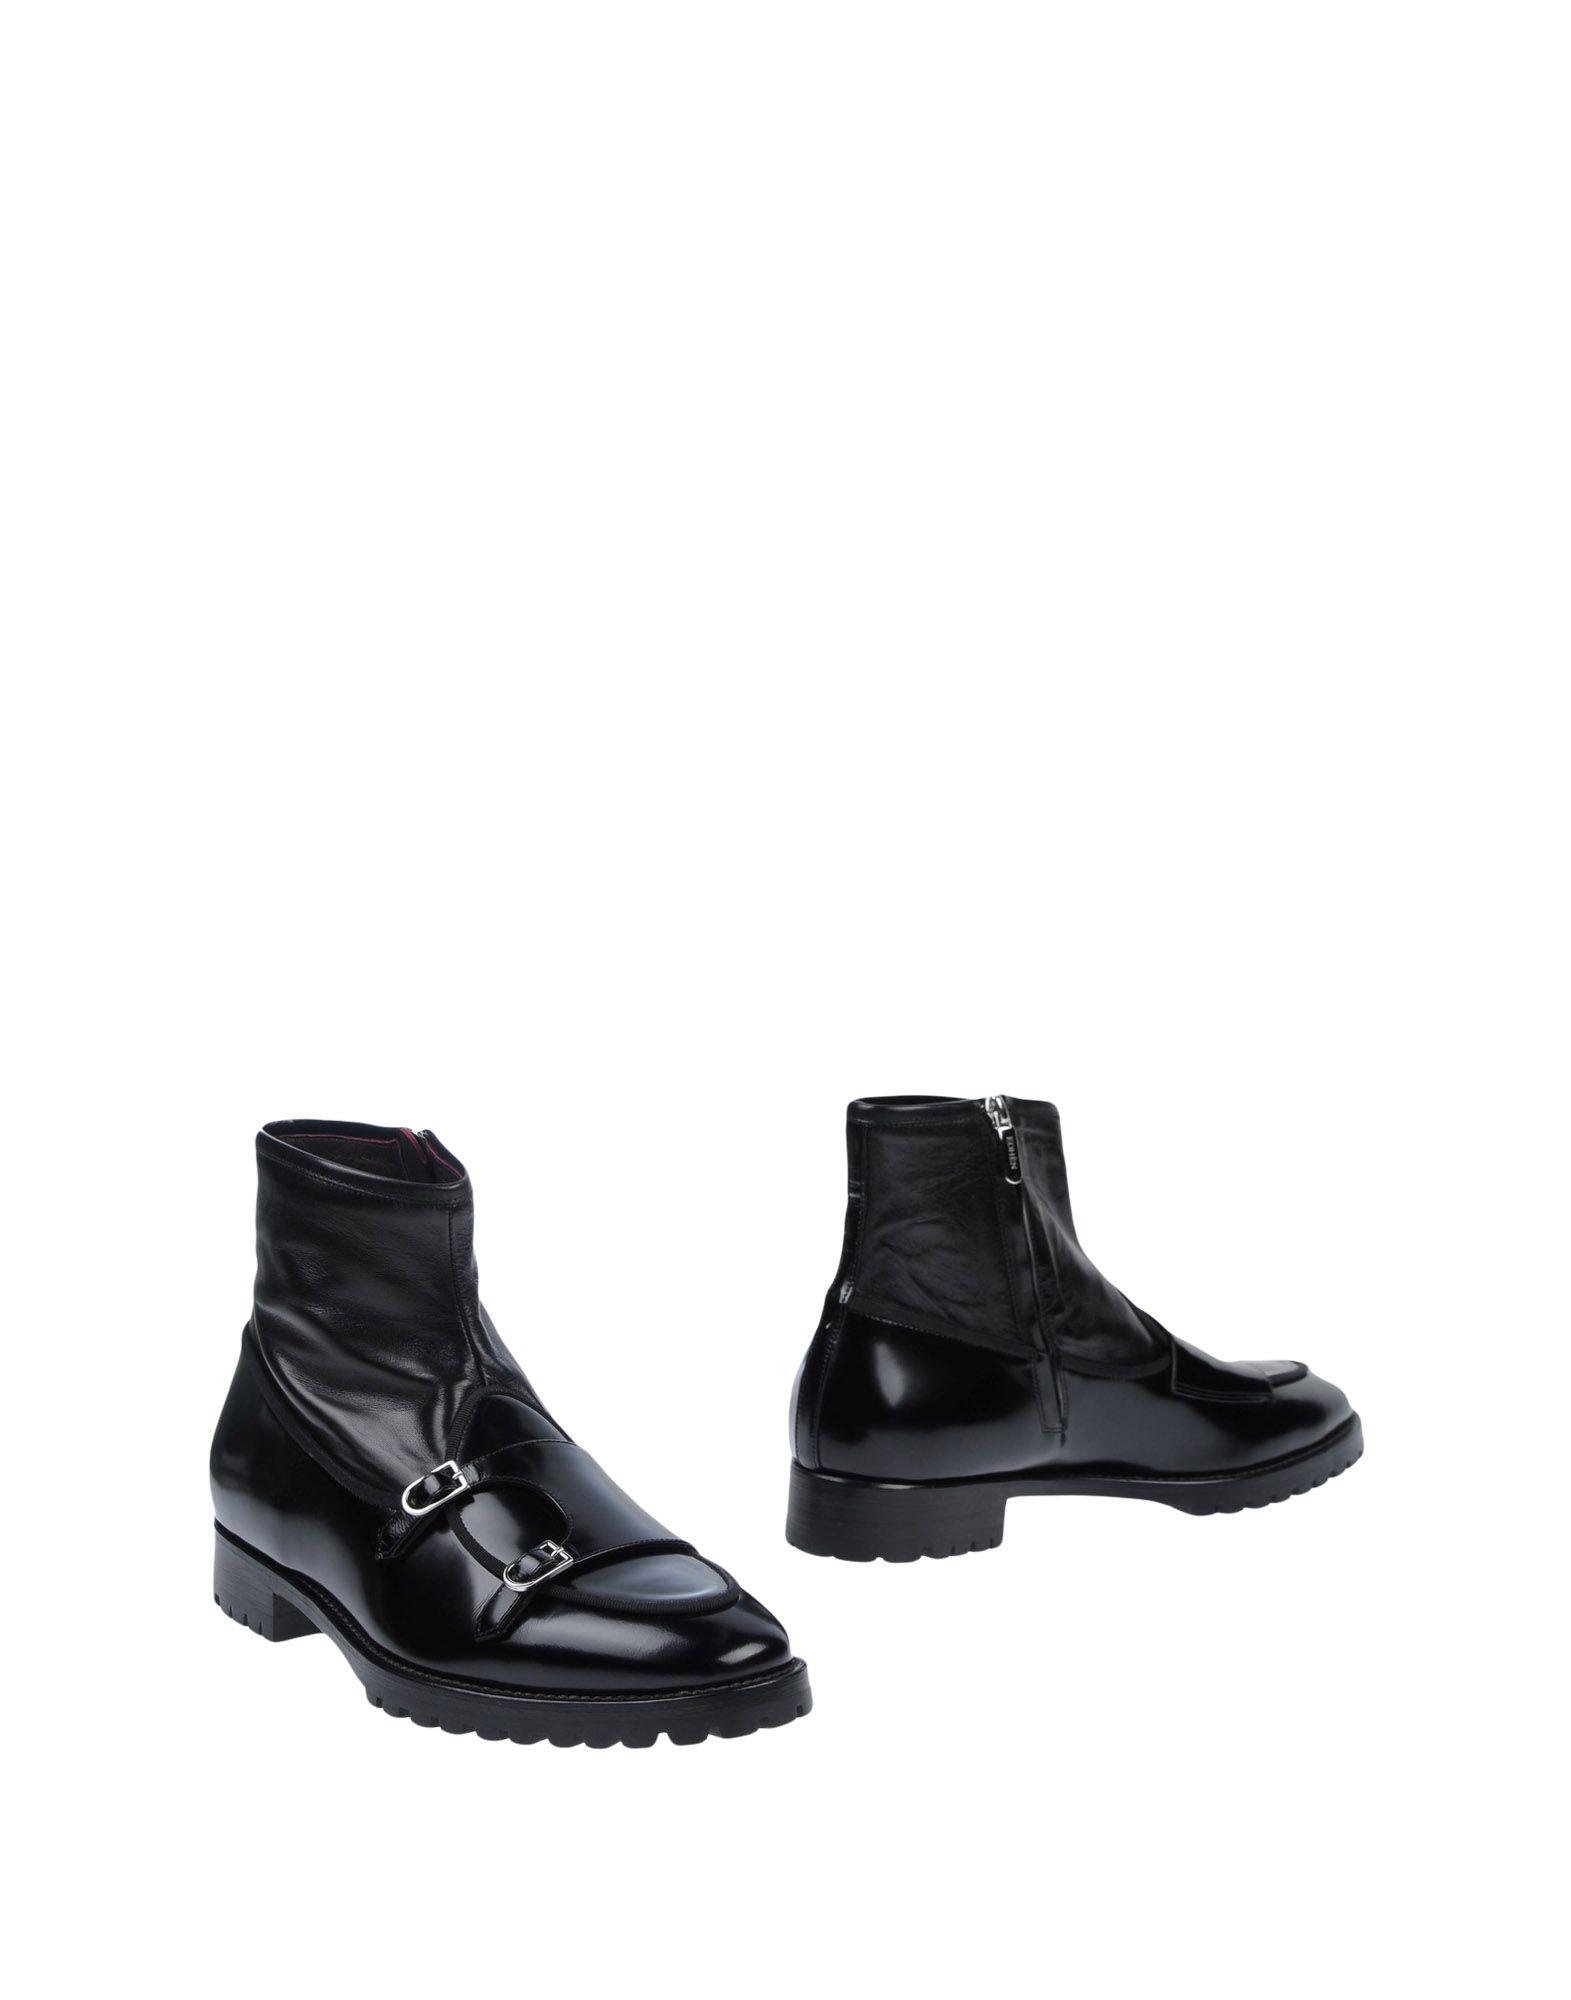 Edhèn Milano Boots - Men Edhèn Milano Boots - online on  Canada - Boots 11508047OO afef37